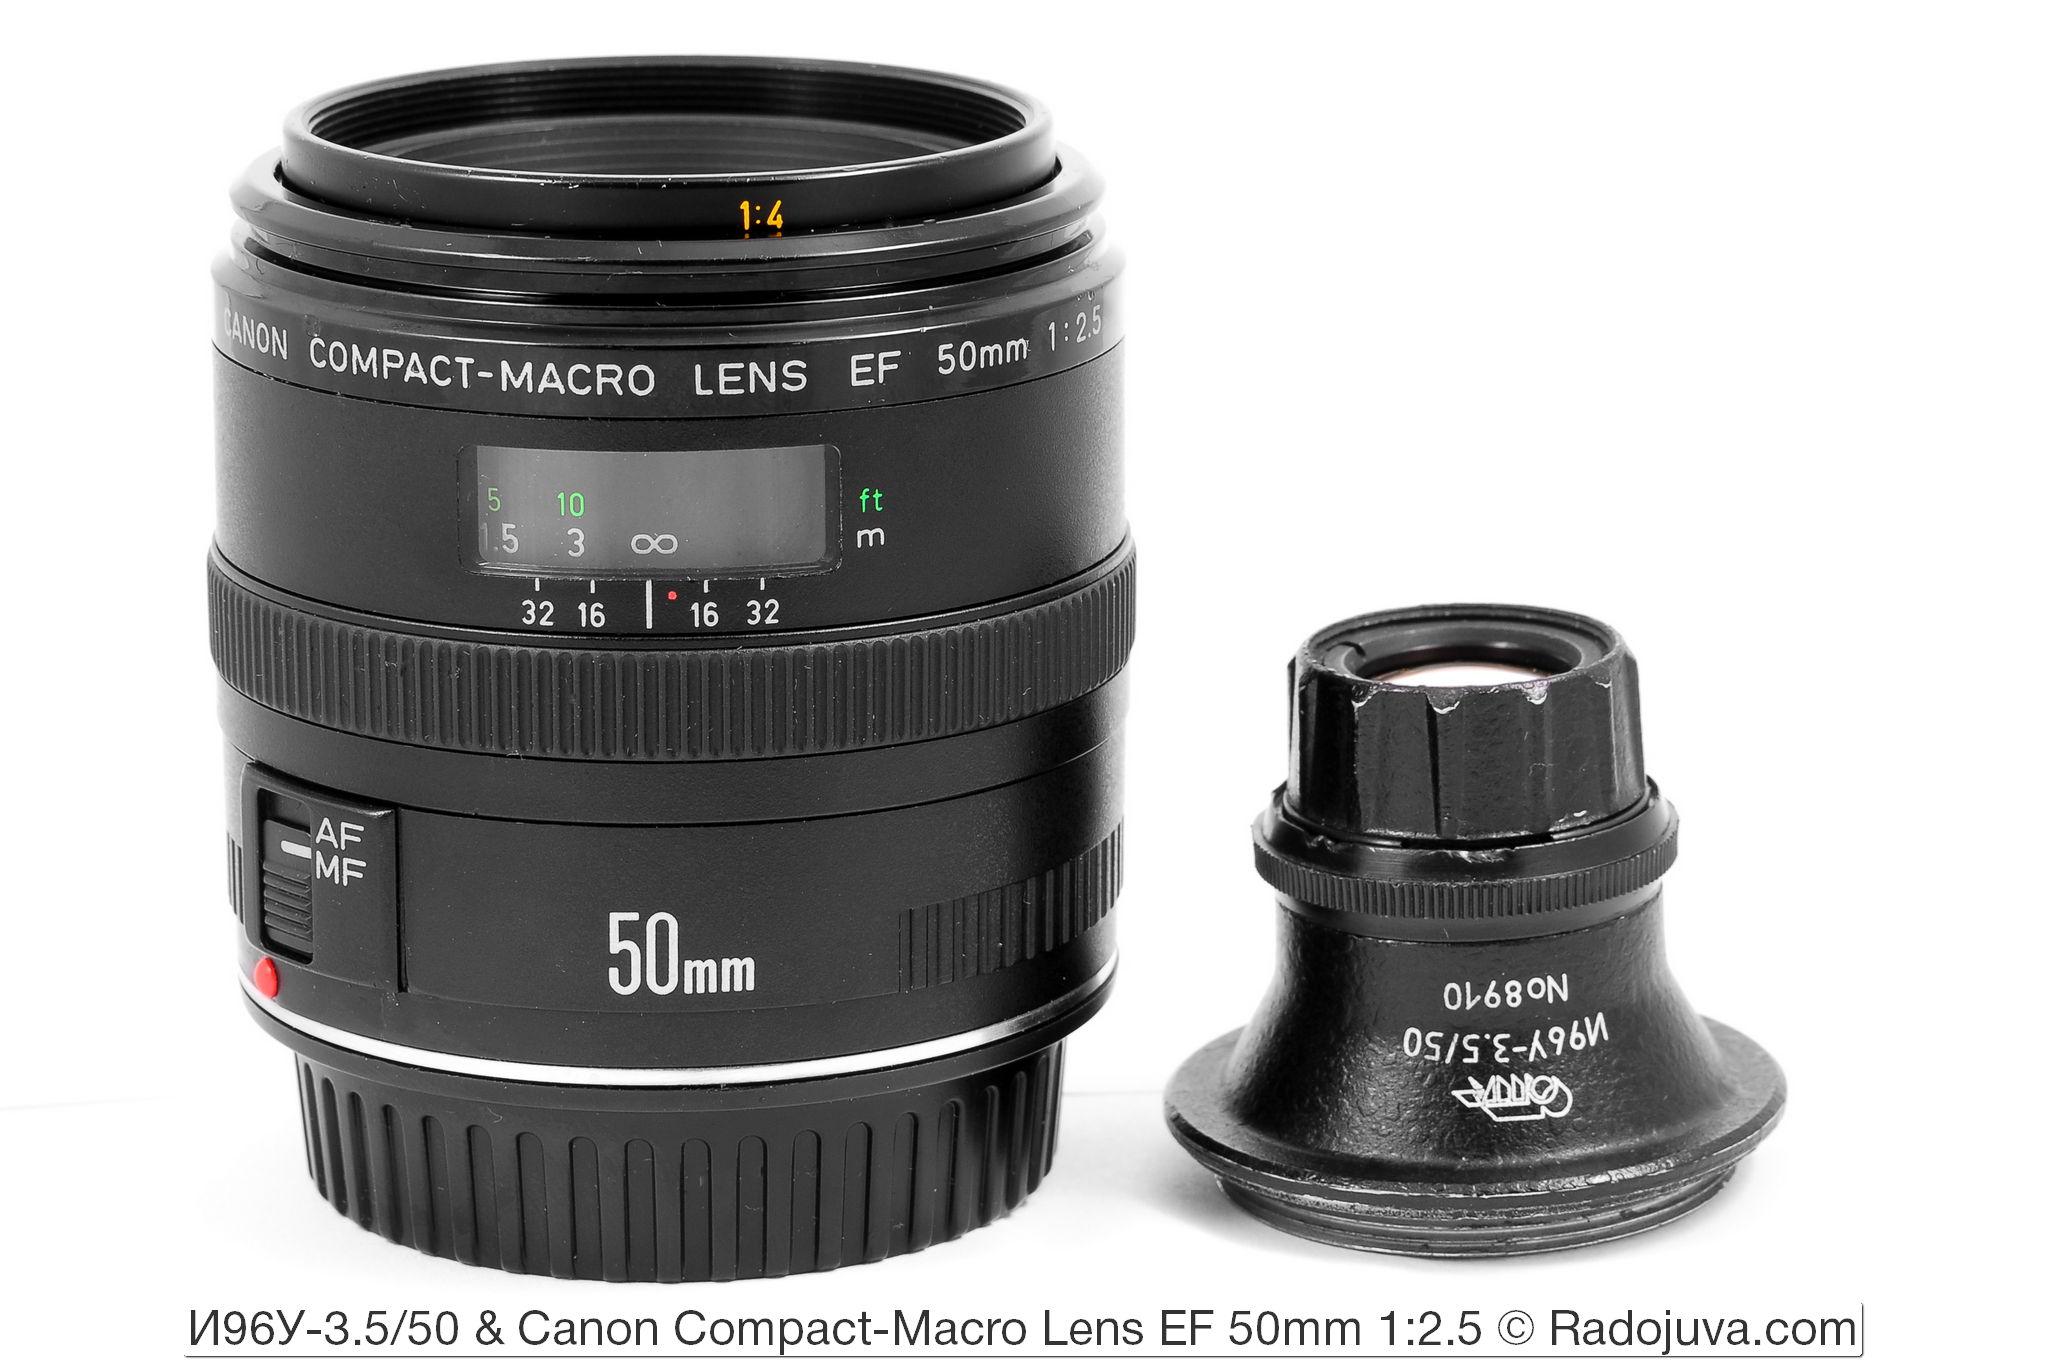 Размеры объективов Canon Compact-Macro Lens EF 50mm 1:2.5 и Индустар-96